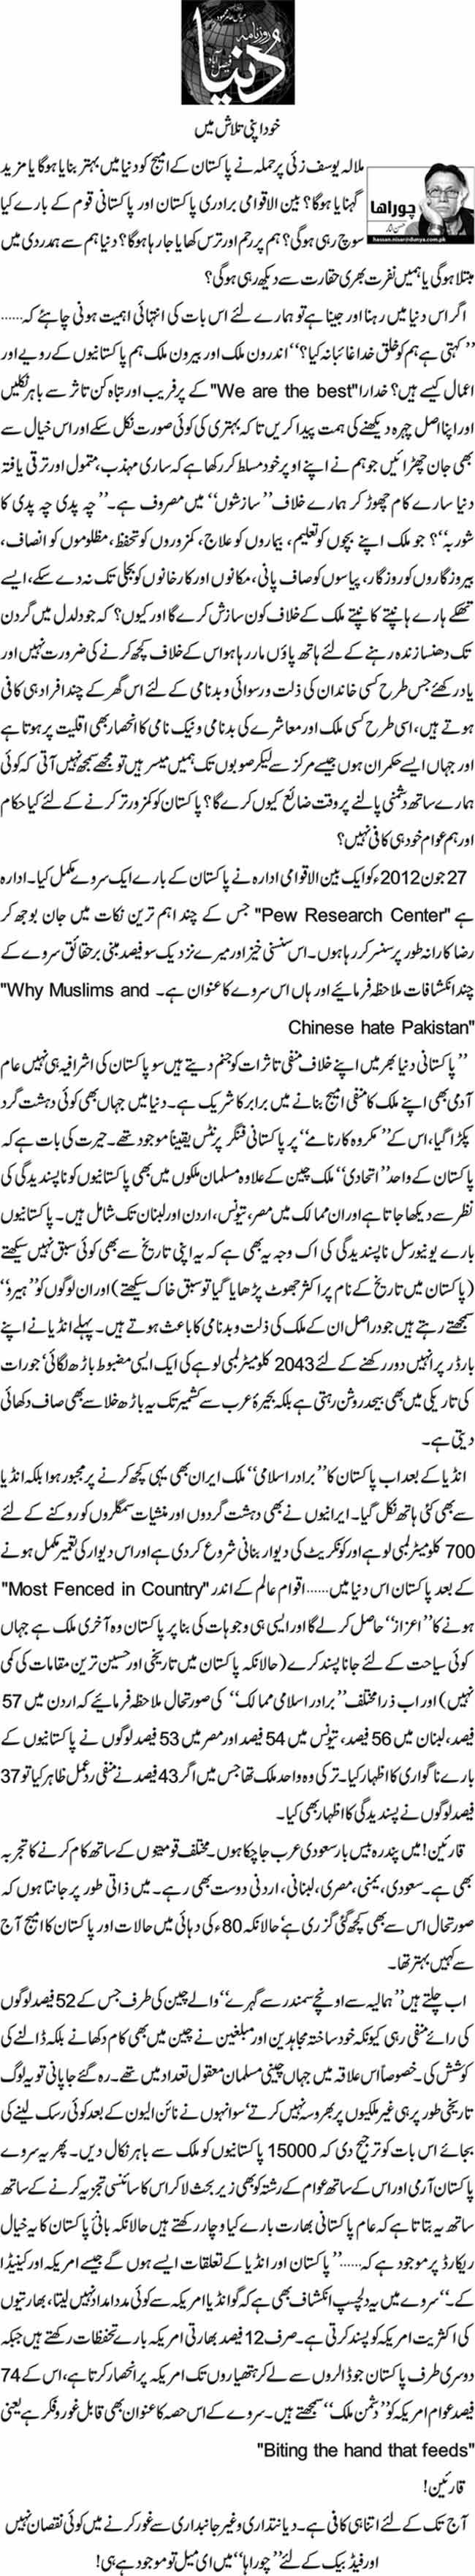 Khud apni taalsh mai - Hassan Nisar